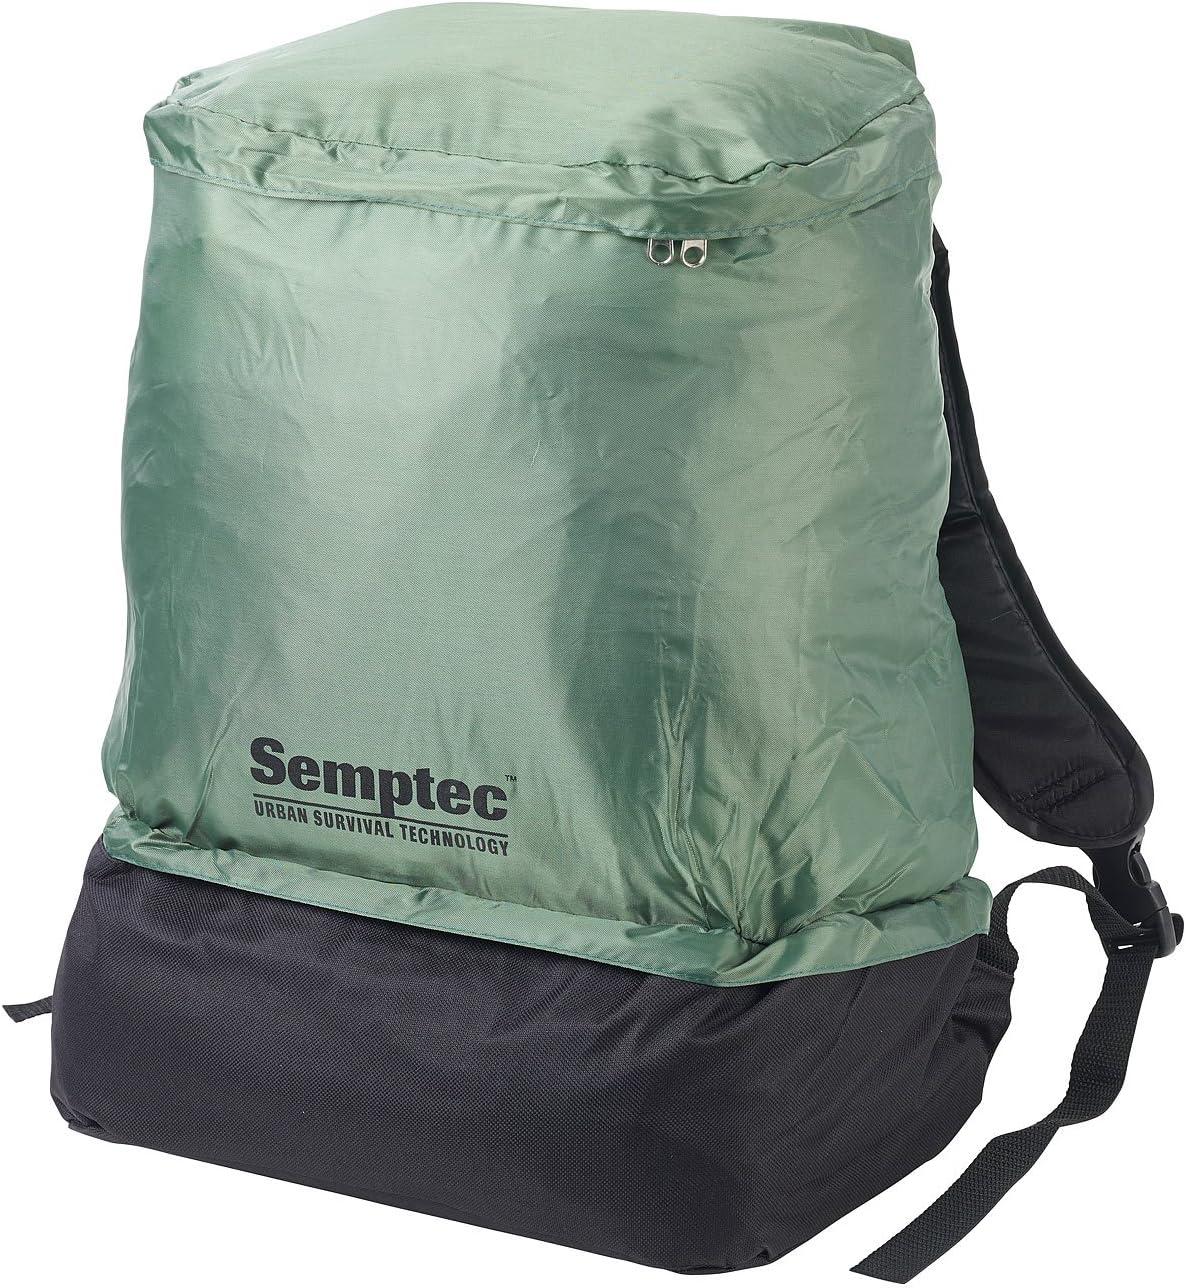 Semptec Ultrakompaktes Rucksack-Tunnelzelt für 1 Person 1.500 mm Wassersäule